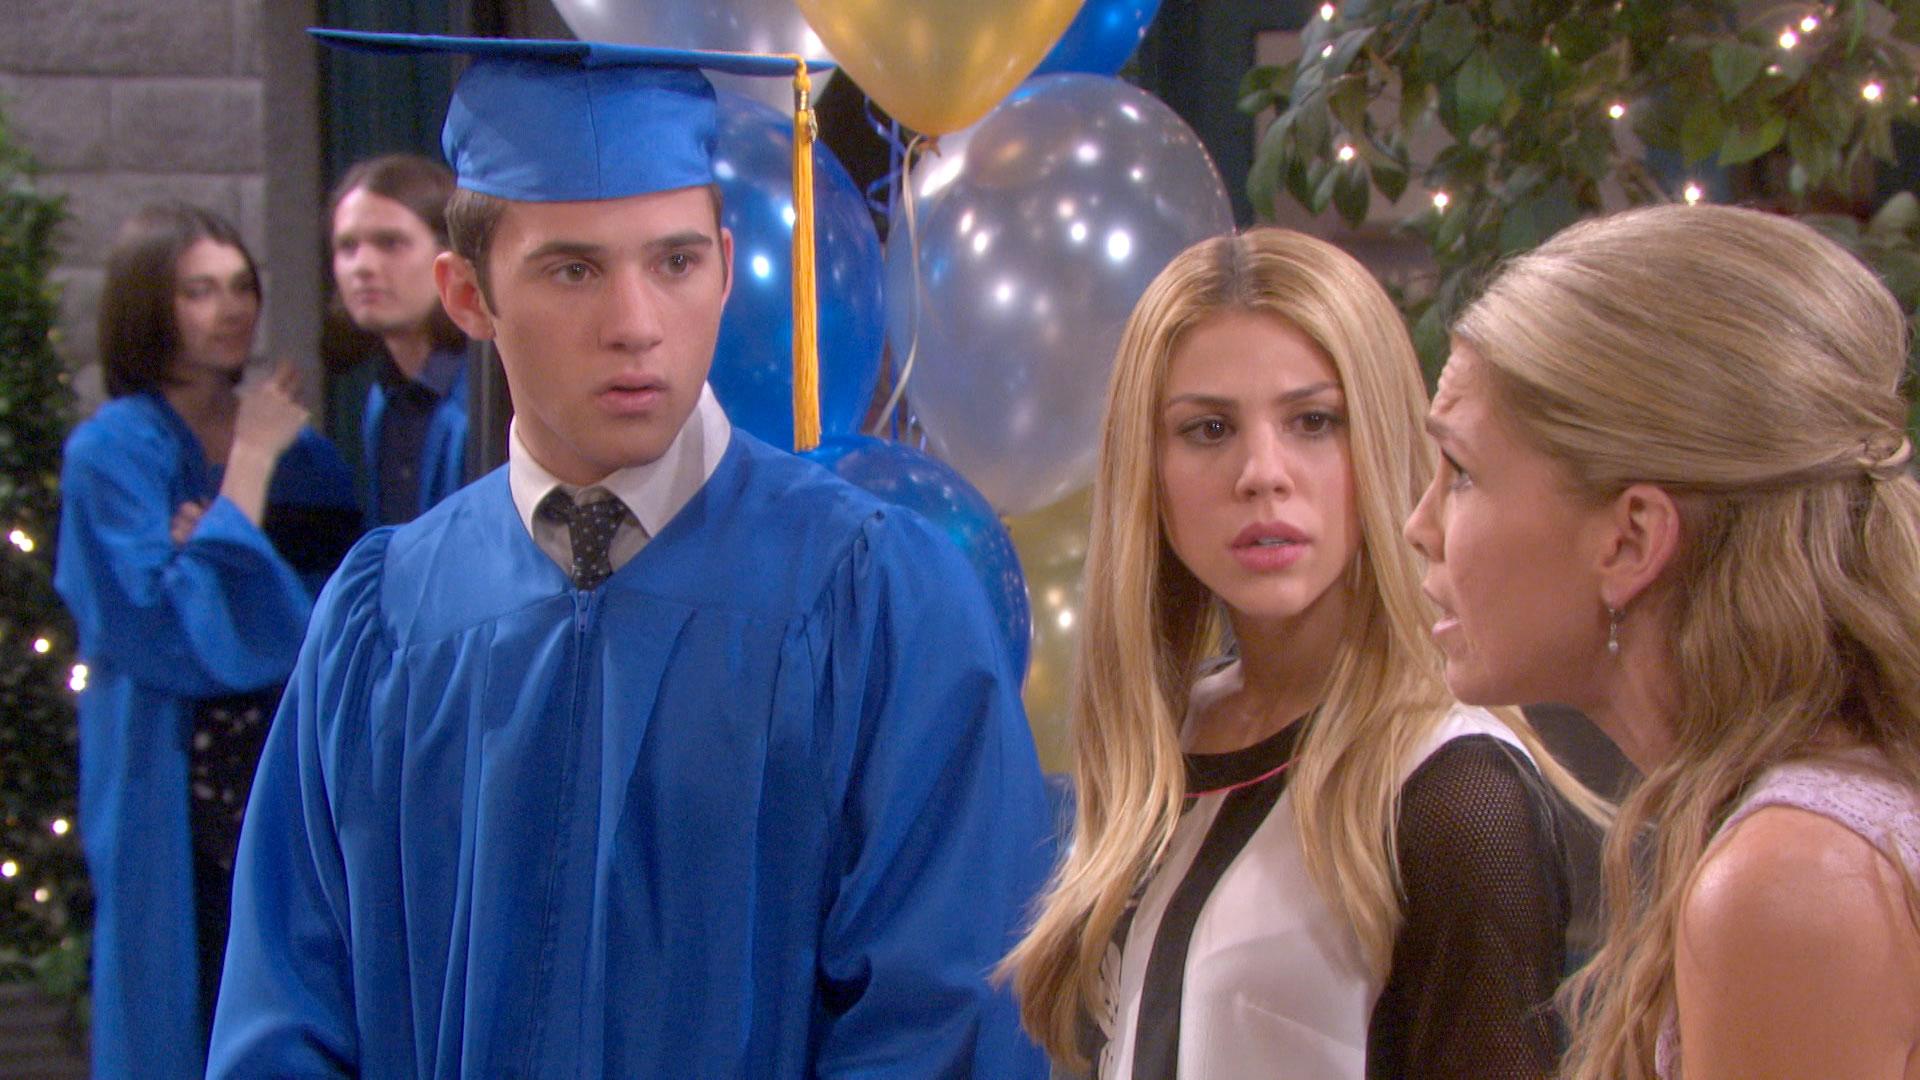 JJ's graduation day is marred by Eve's lawsuit against Jennifer.